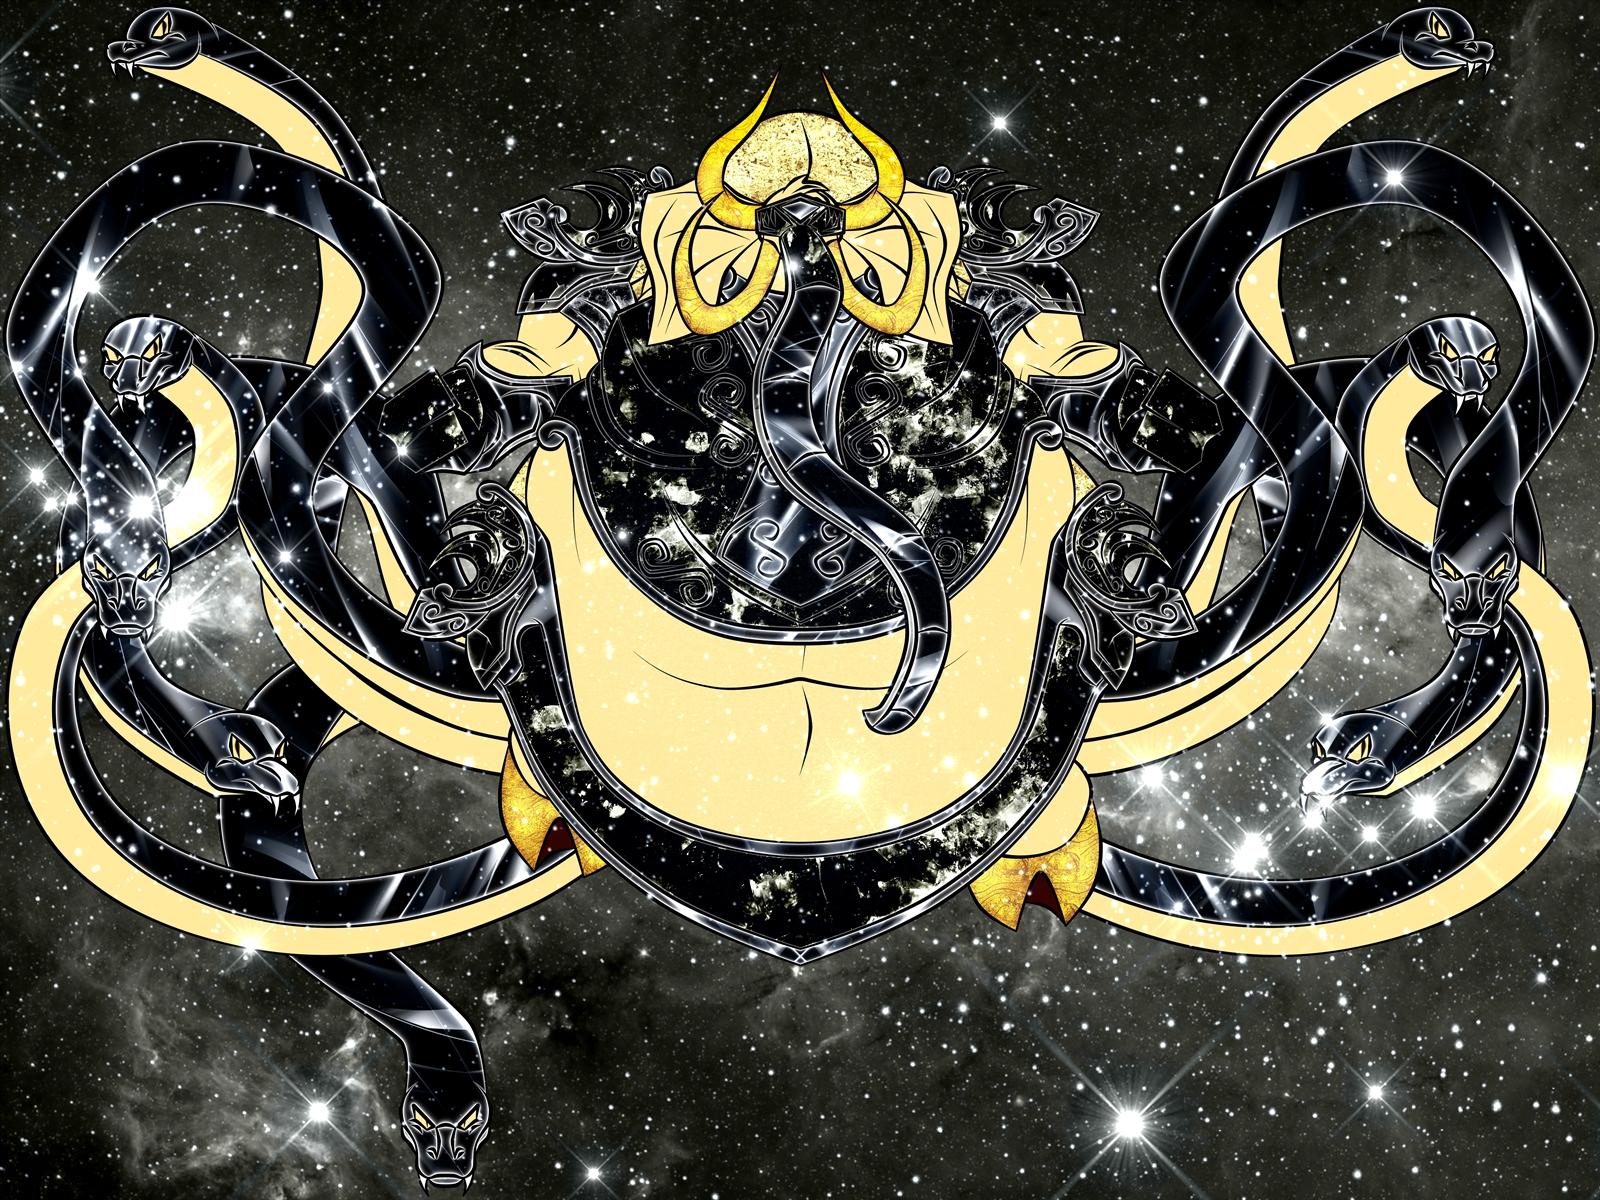 jinthethicchimera-core-of-the-galaxy.jpg